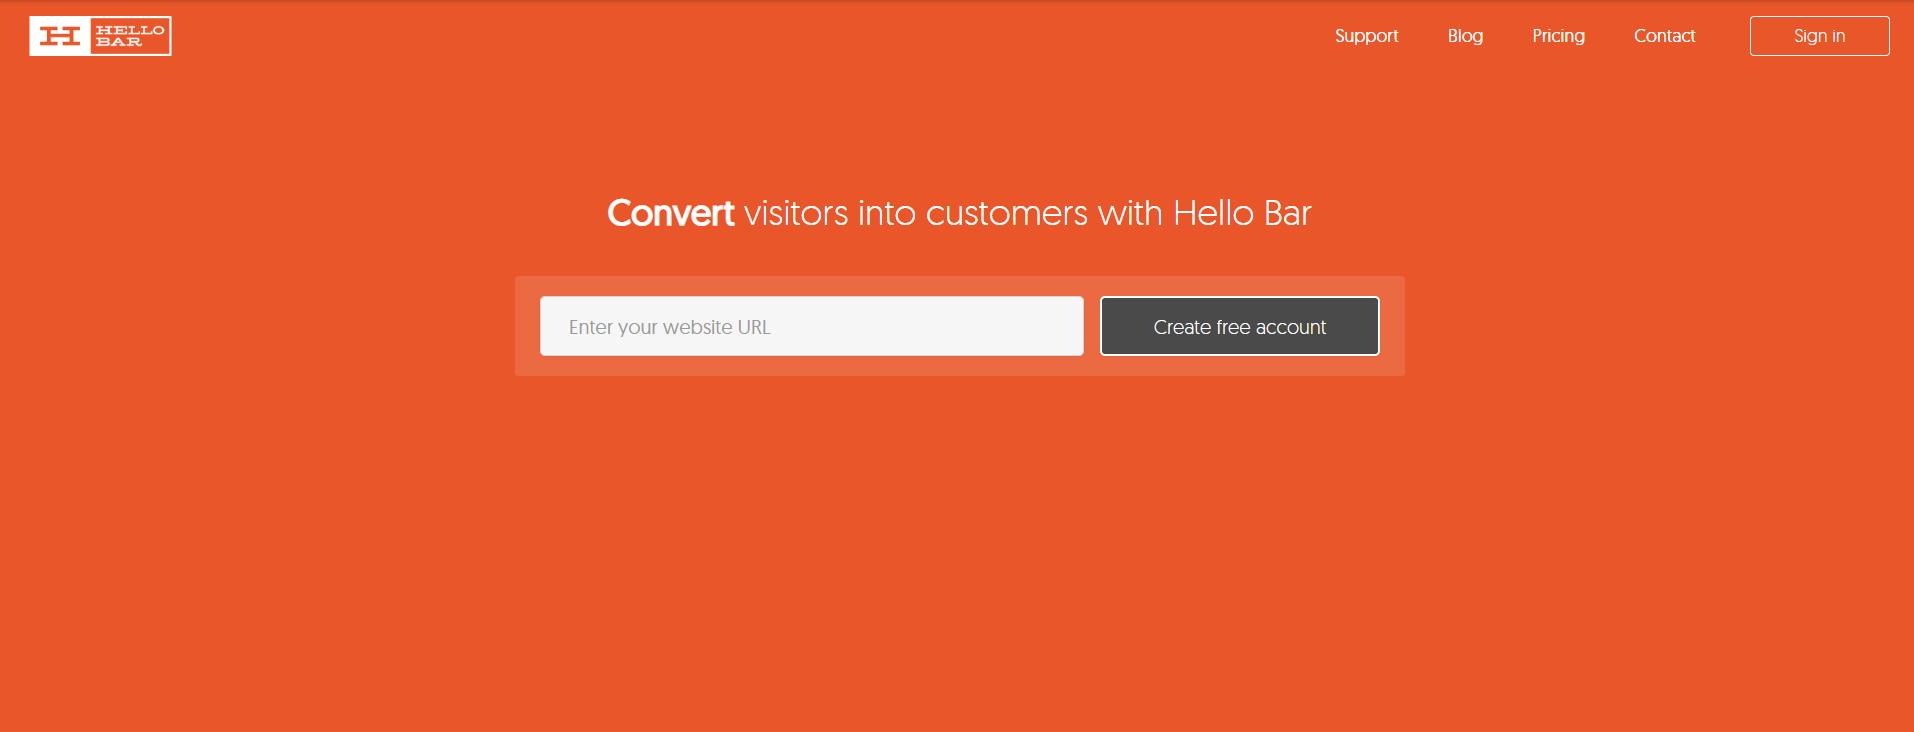 Hello bar - Lead generation tools